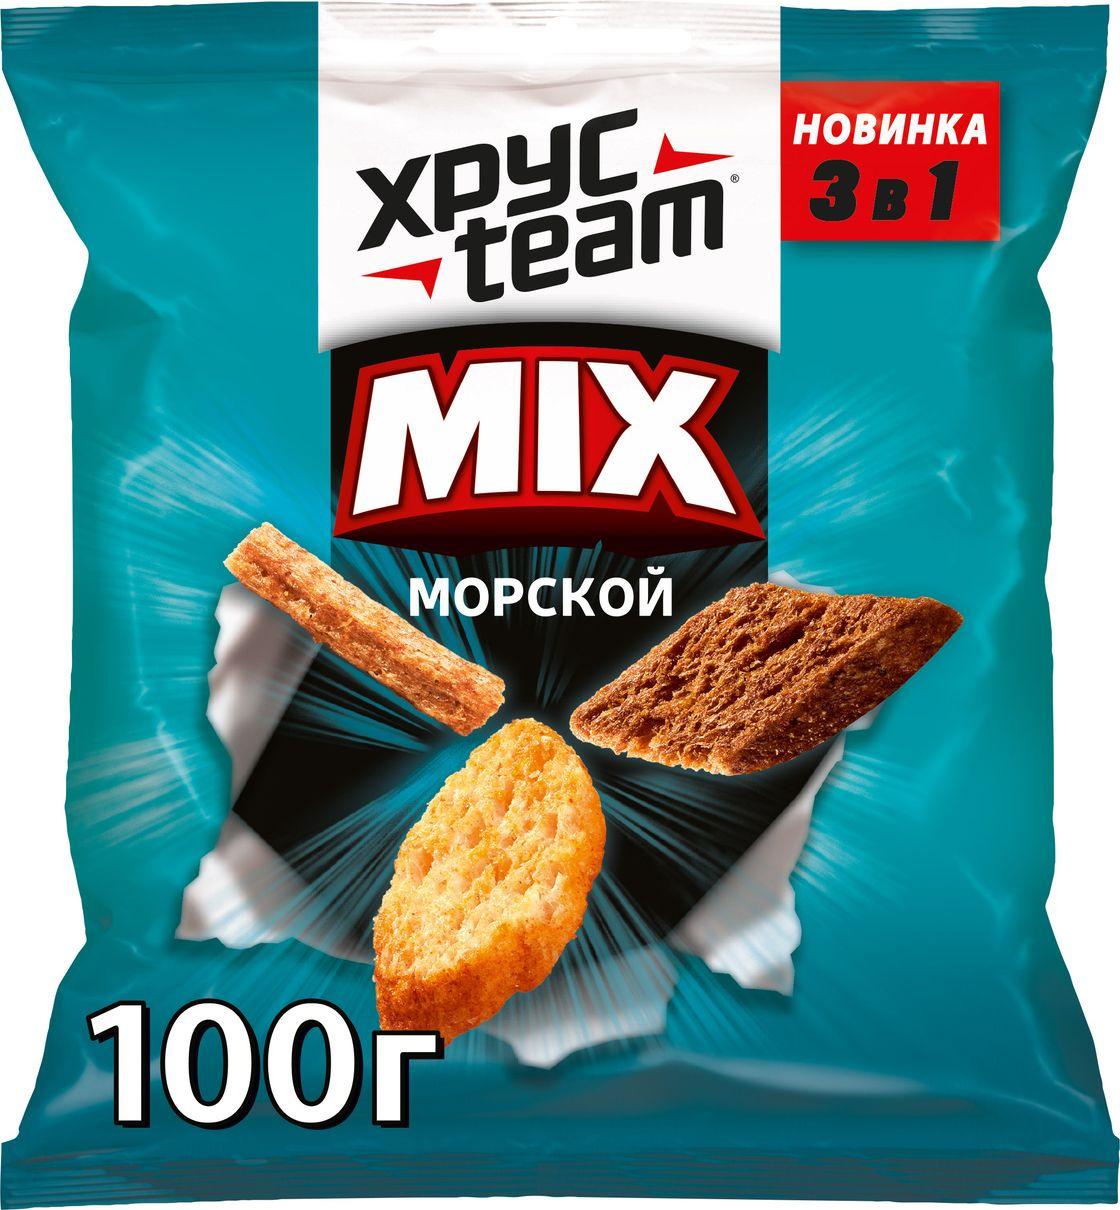 Сухарики Хрусteam Mix Морской, 100 г хрусteam твистеr сухарики бекон 45 г